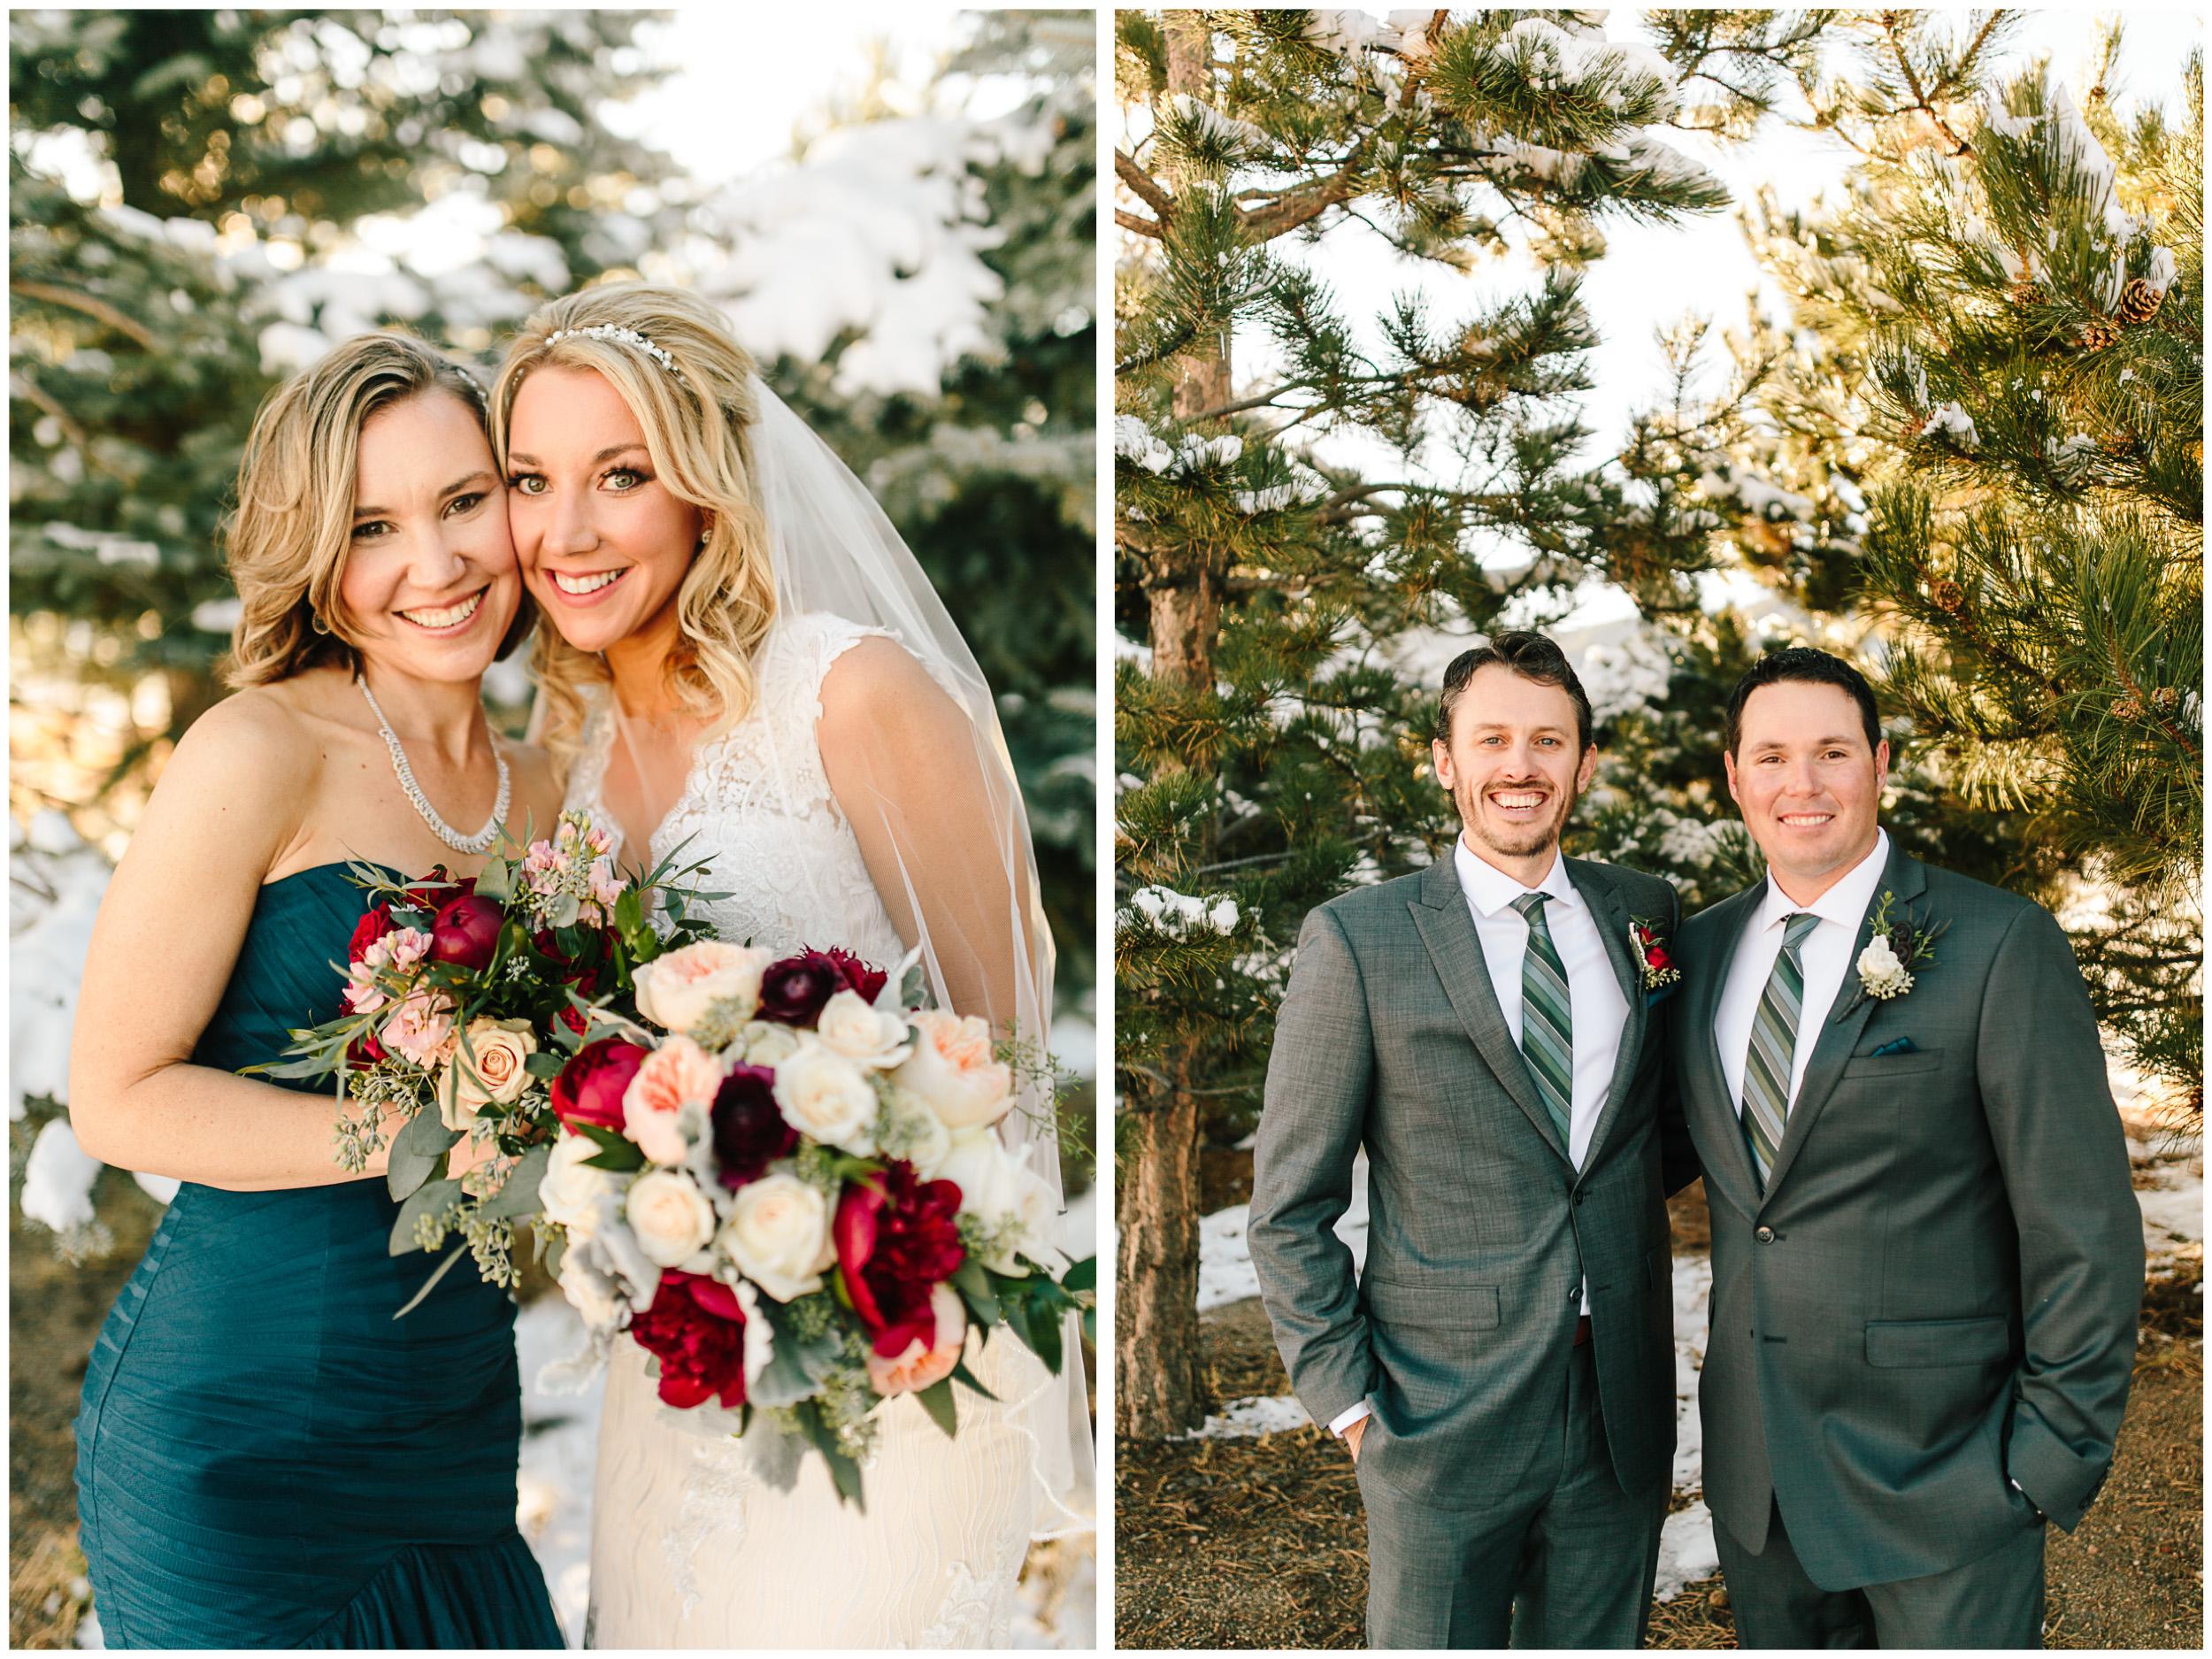 spruce_mountain_ranch_wedding_35.jpg